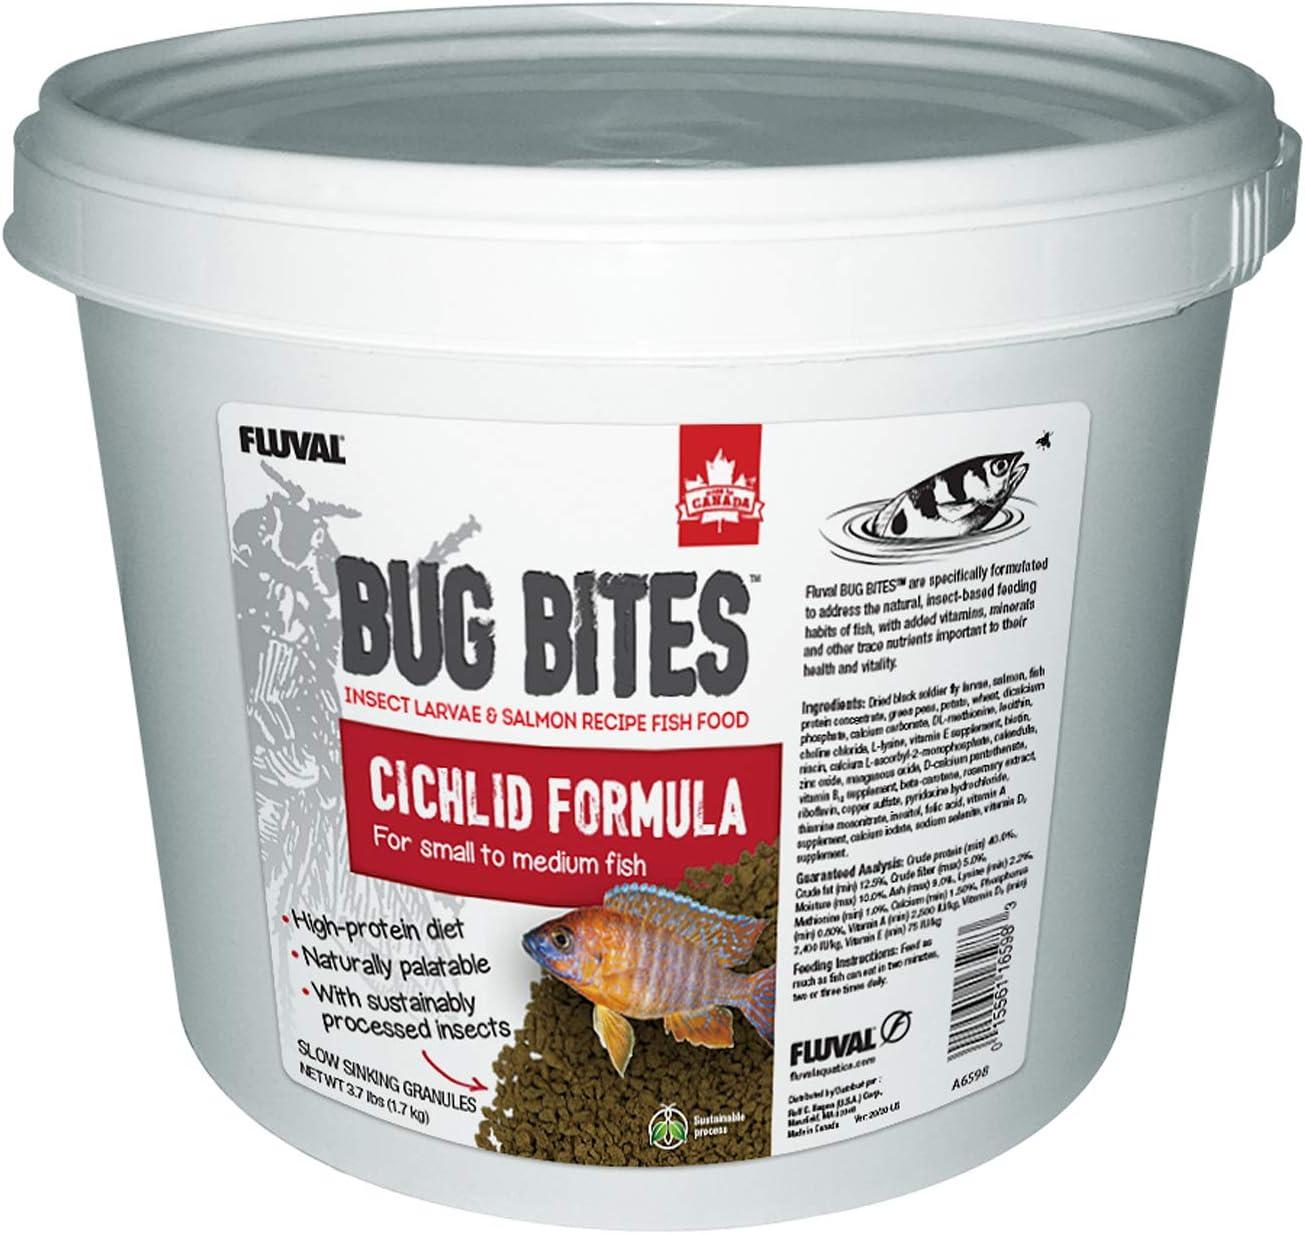 Fluval Bug Bites Cichlid Fish Food, Granules for Small to Medium Sized Fish, 3.74 lb., A6598